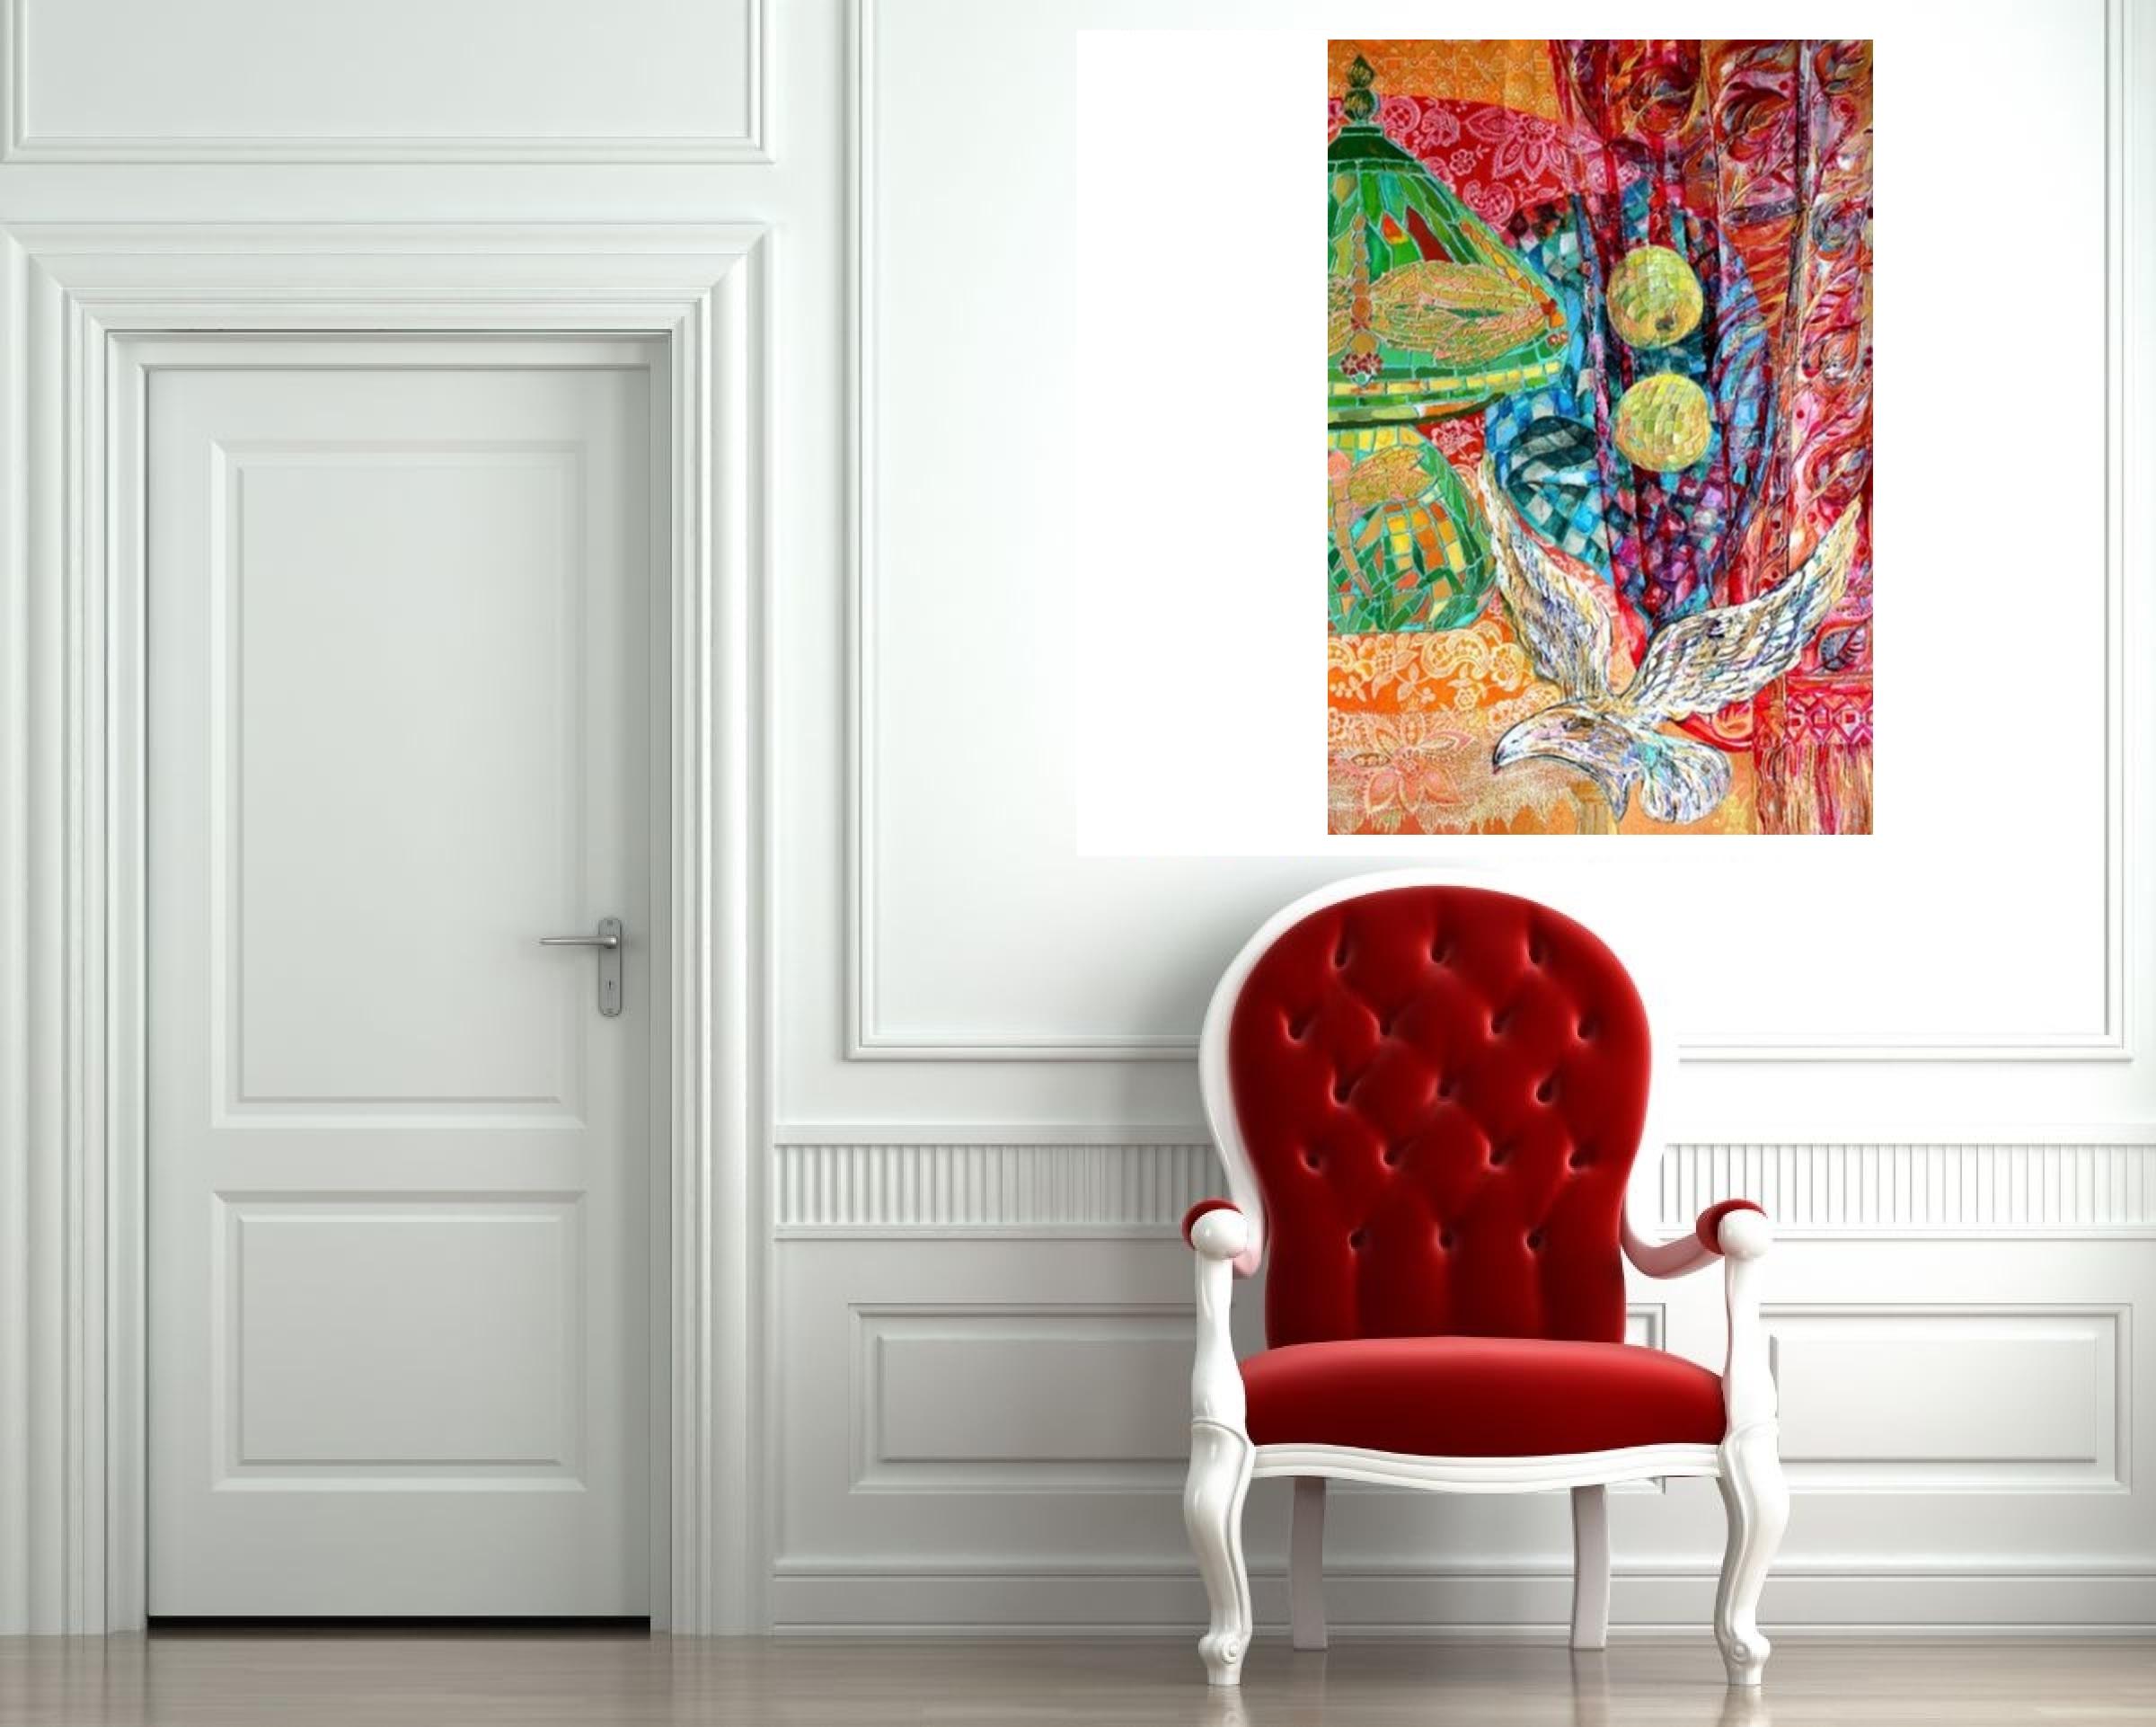 """Tiffany Lamp"" Rumyanka Bozhkova Thematic Painting"